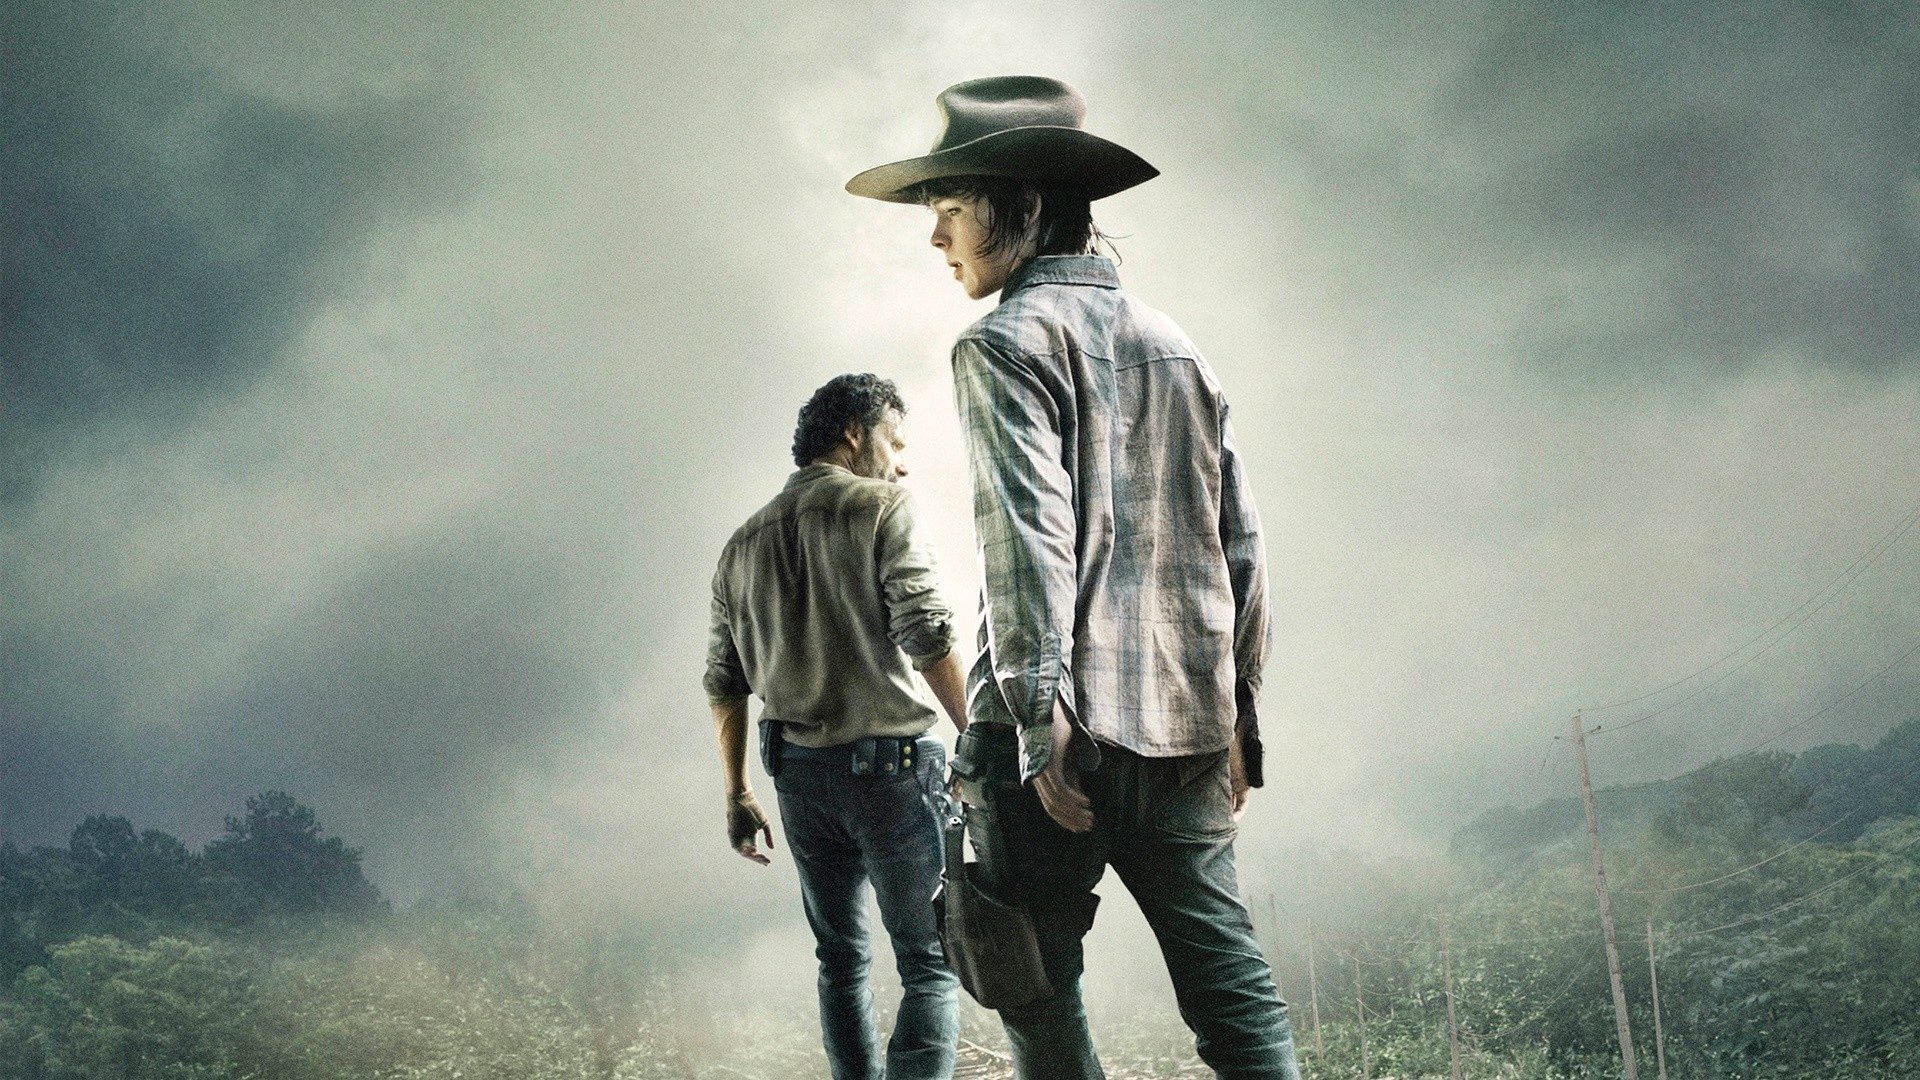 The Walking Dead 2014 Wallpapers   HD Wallpapers